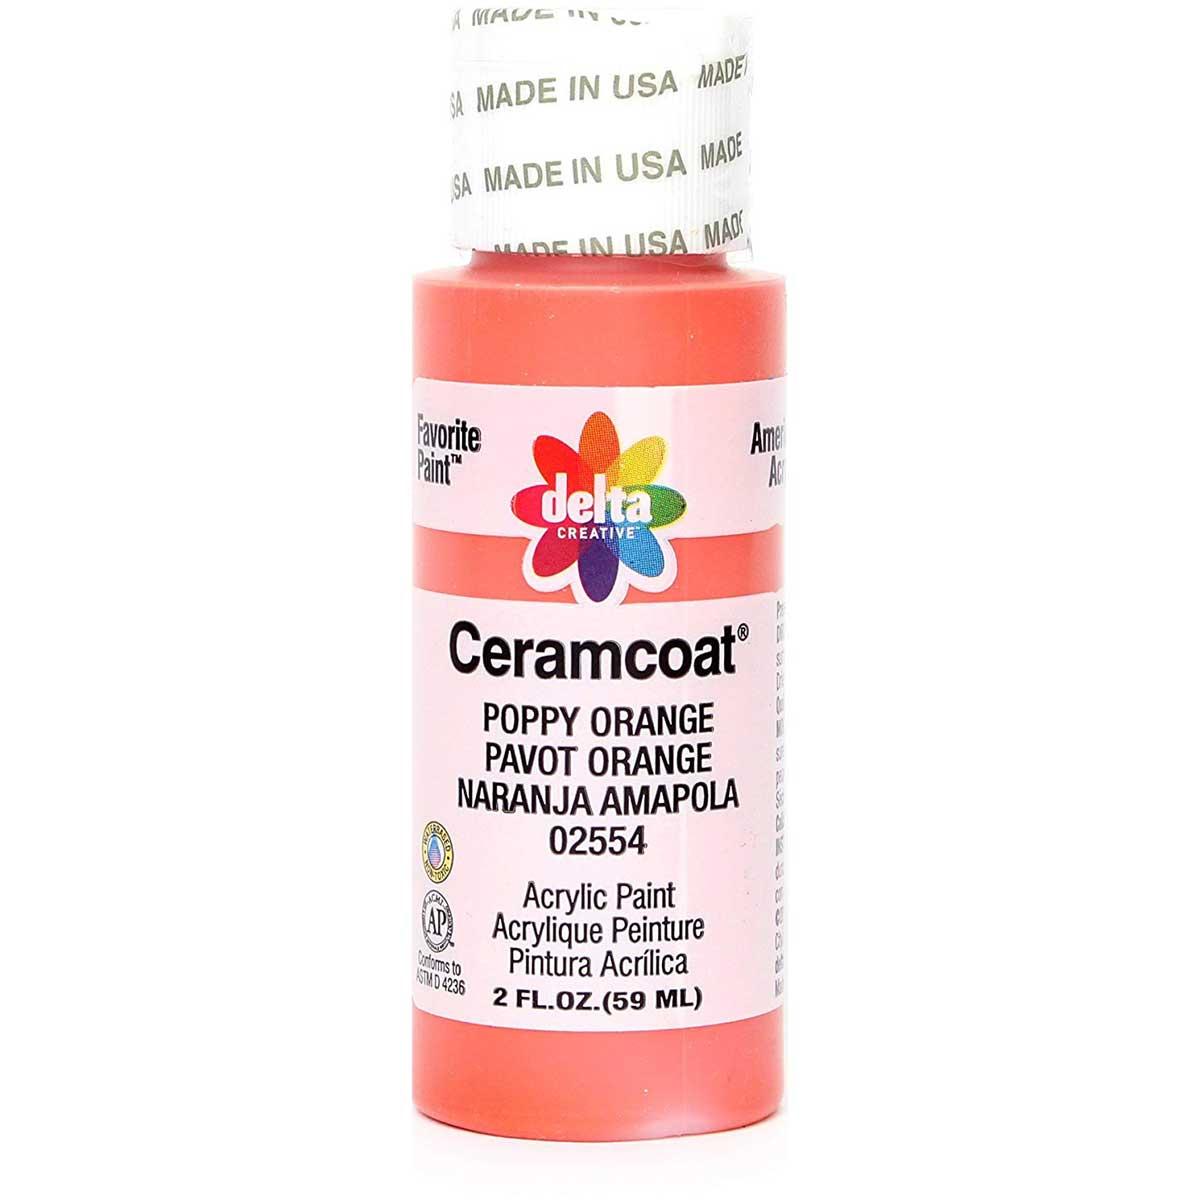 Delta Ceramcoat ® Acrylic Paint - Poppy Orange, 2 oz. - 025540202W